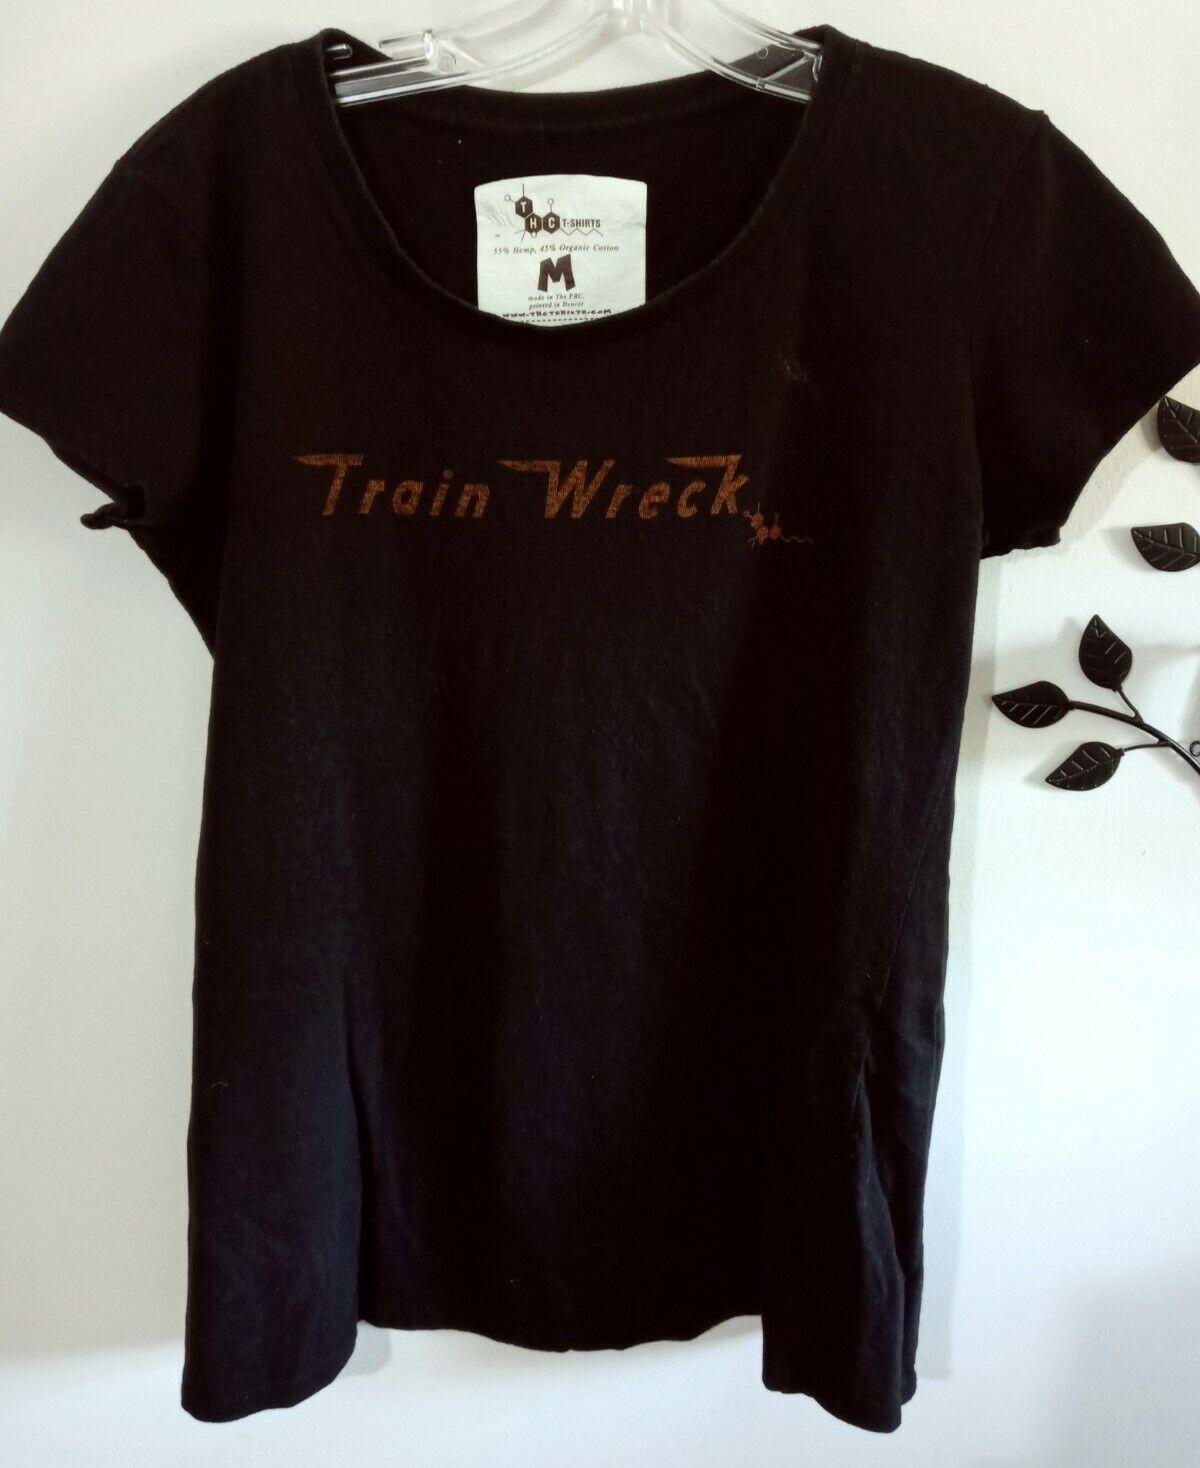 THC T-Shirt Women's Size M Black Organic Cotton & Hemp Train Wreck